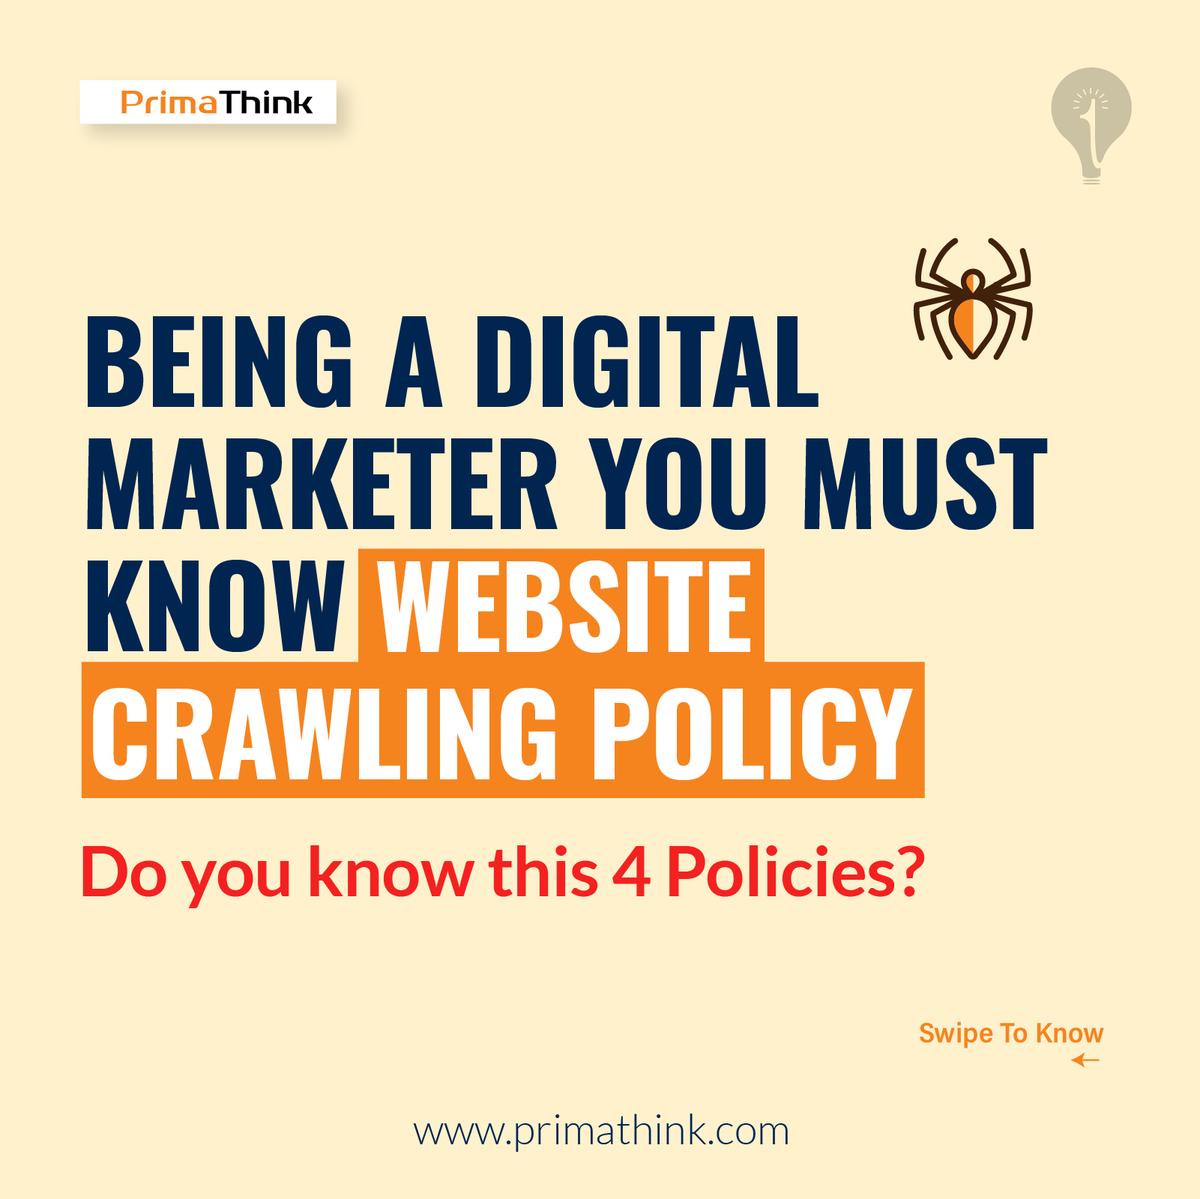 𝗪𝗲𝗯 𝗰𝗿𝗮𝘄𝗹𝗲𝗿𝘀 𝗮𝗿𝗲 𝗮 𝗰𝗲𝗻𝘁𝗿𝗮𝗹 𝗽𝗮𝗿𝘁 𝗼𝗳 𝘀𝗲𝗮𝗿𝗰𝗵 𝗲𝗻𝗴𝗶𝗻𝗲𝘀, 𝘀𝗼 𝗸𝗻𝗼𝘄𝗶𝗻𝗴 𝗶𝘁 𝗵𝗲𝗹𝗽𝘀 𝗯𝘂𝗶𝗹𝗱𝗶𝗻𝗴 𝗦𝗘𝗢 𝘀𝘁𝗿𝗮𝘁𝗲𝗴𝘆 . . To scale your business click the link in the bio. . . #DigitalMarketingServices #amravati https://t.co/6z2QDQkrjx